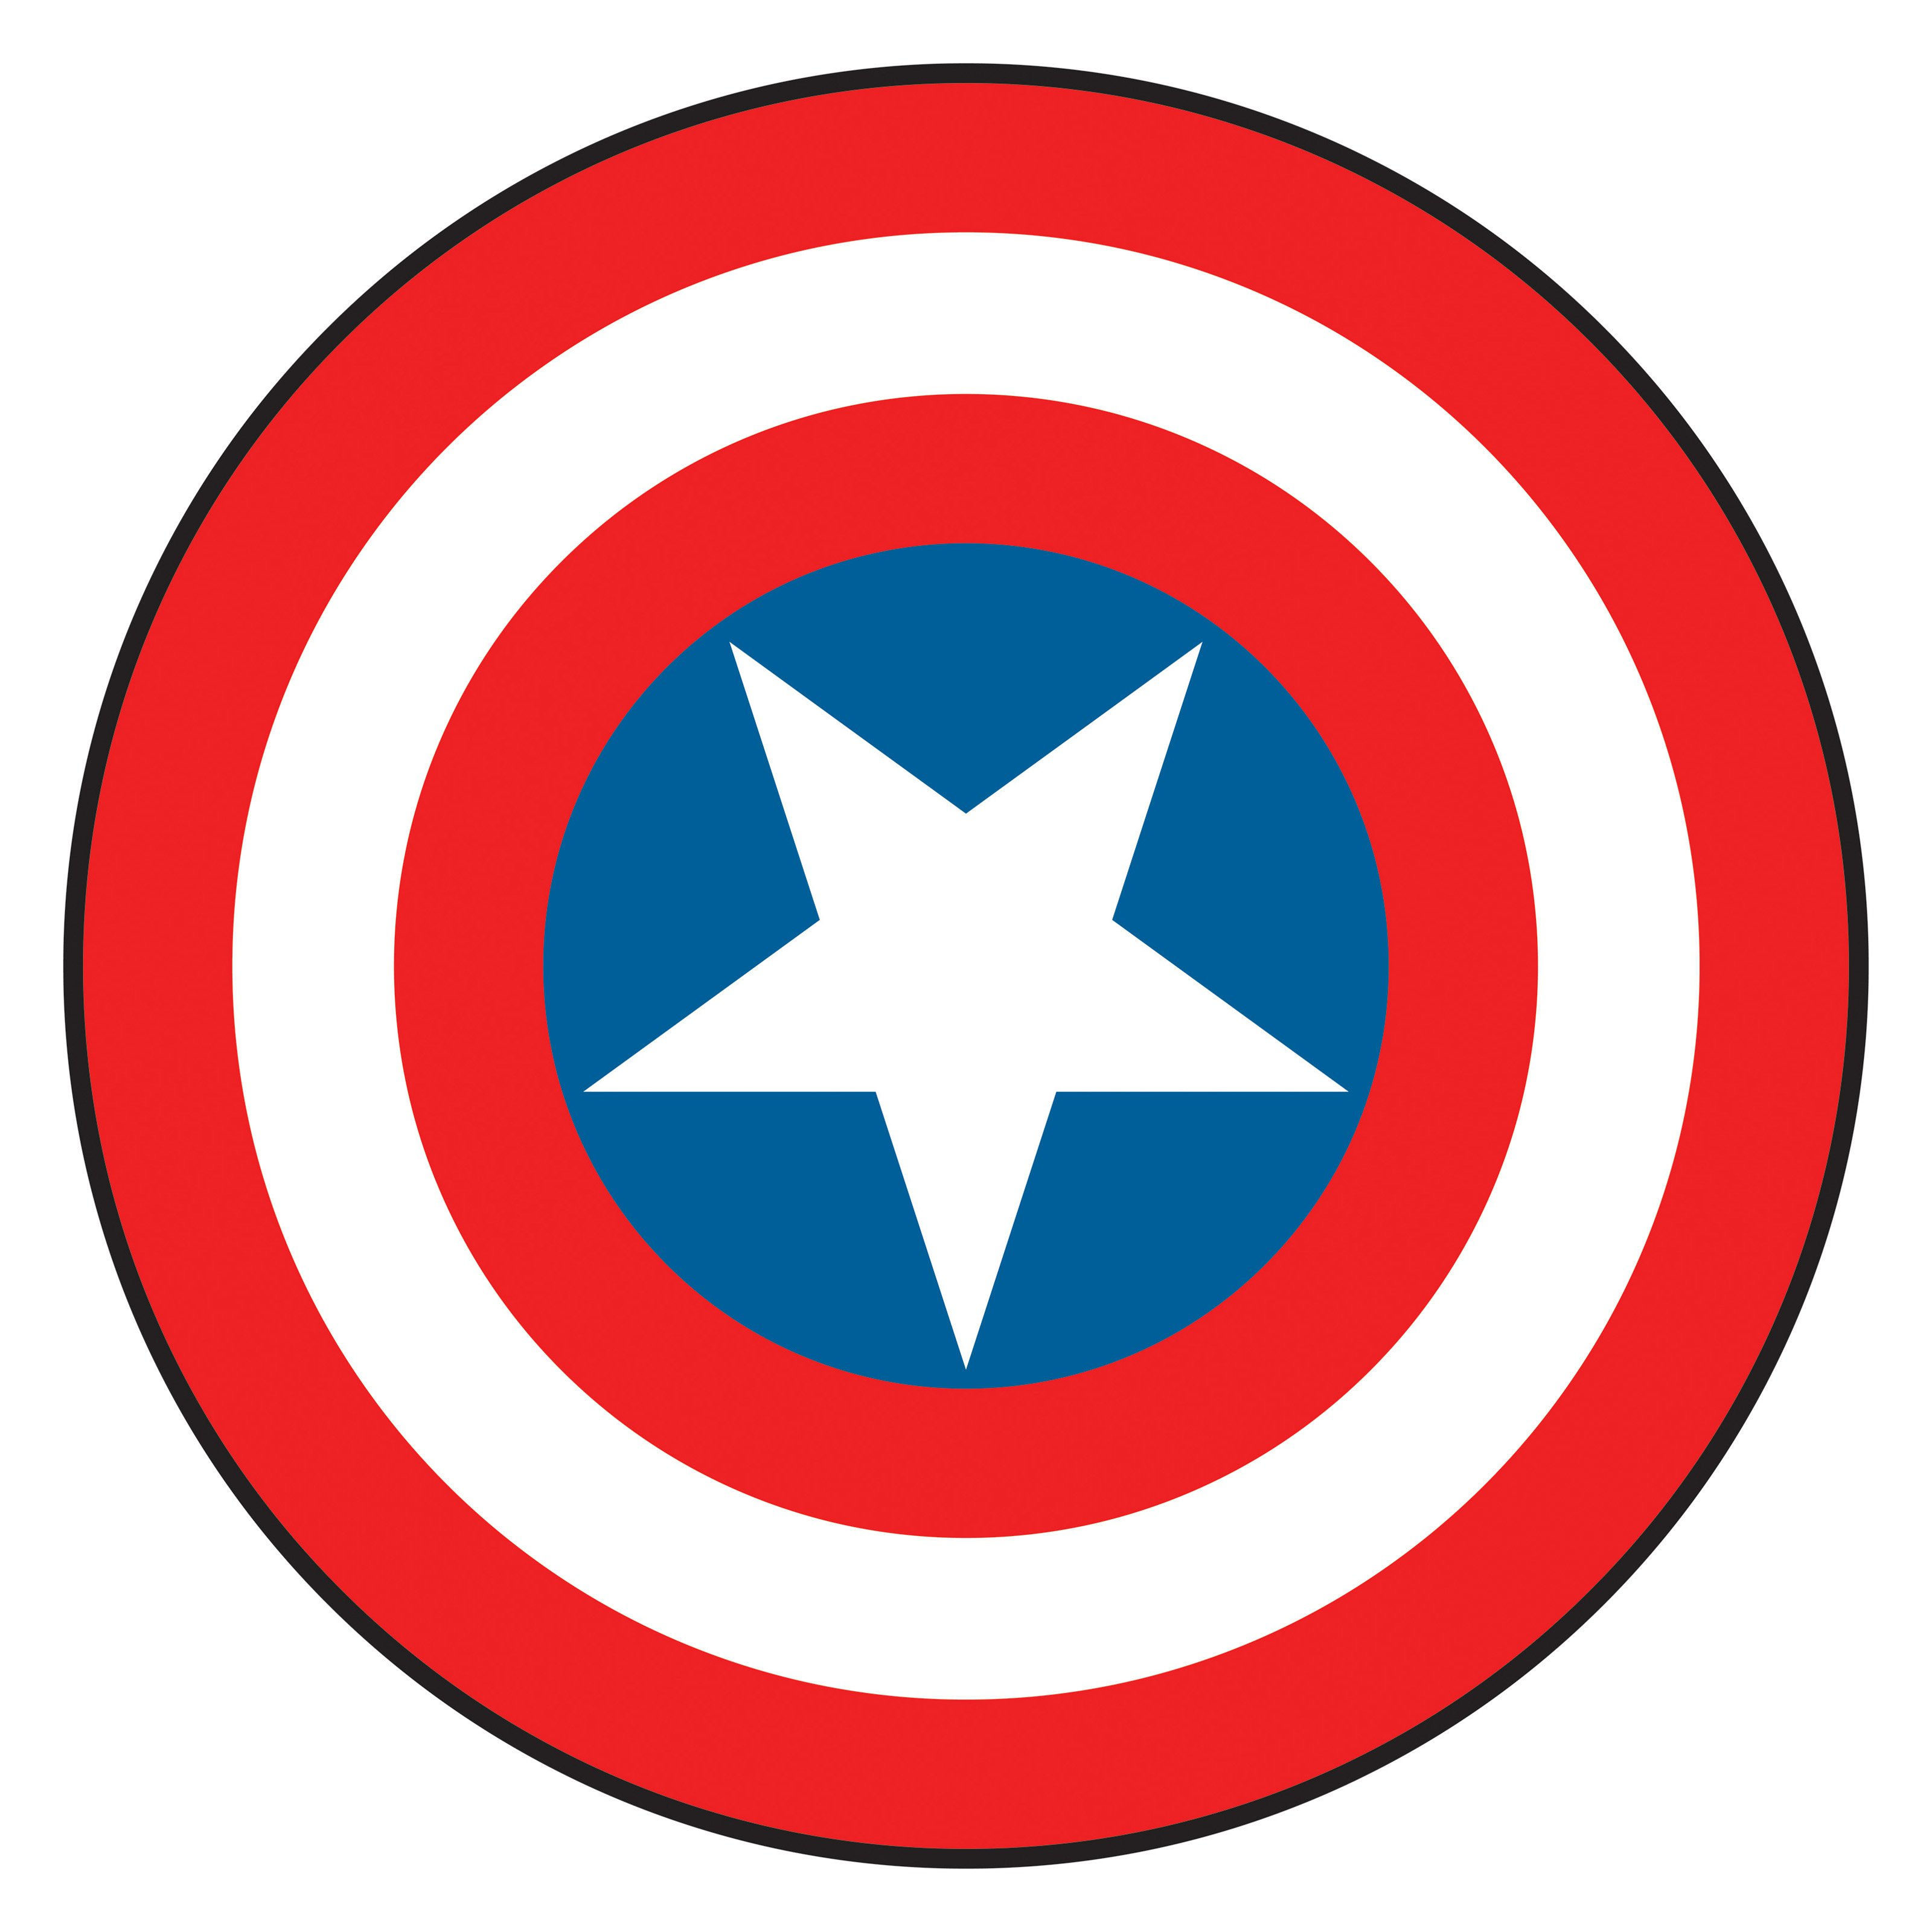 09bbec493a92e5082a8c4398af19ef ... 09bbec493a92e5082a8c4398af19ef ... ... Captain America Clipart .